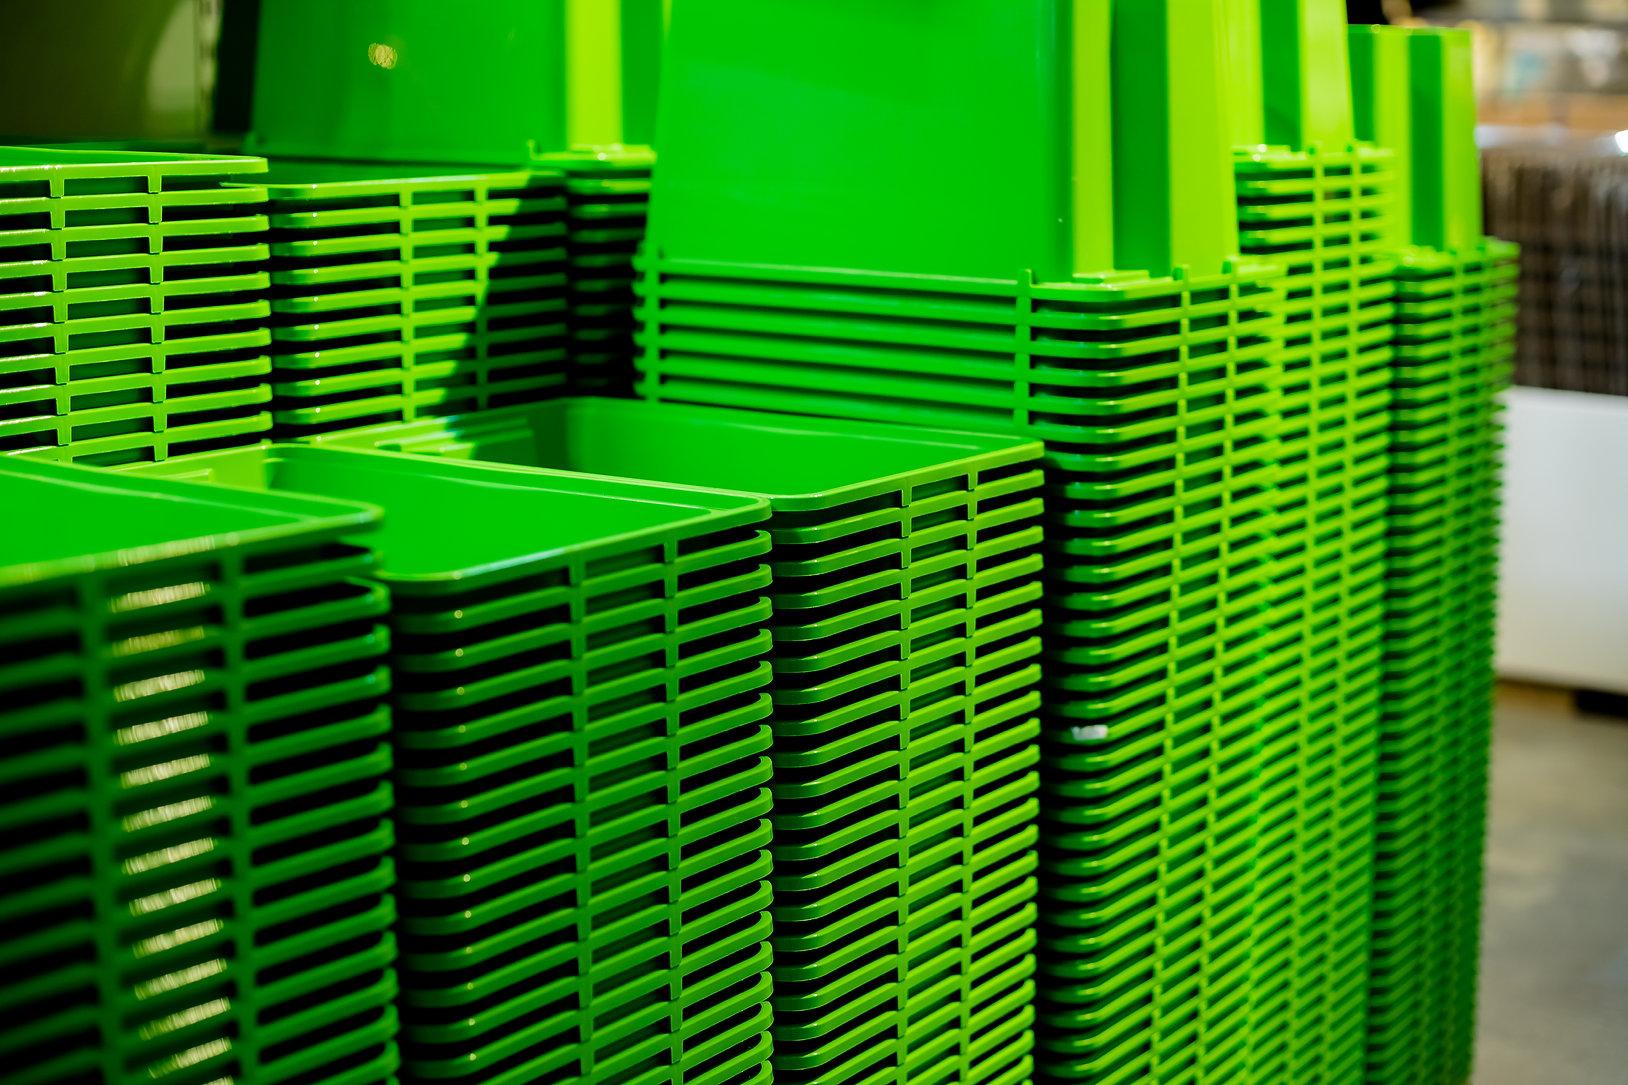 Empty Green Bins.jpg